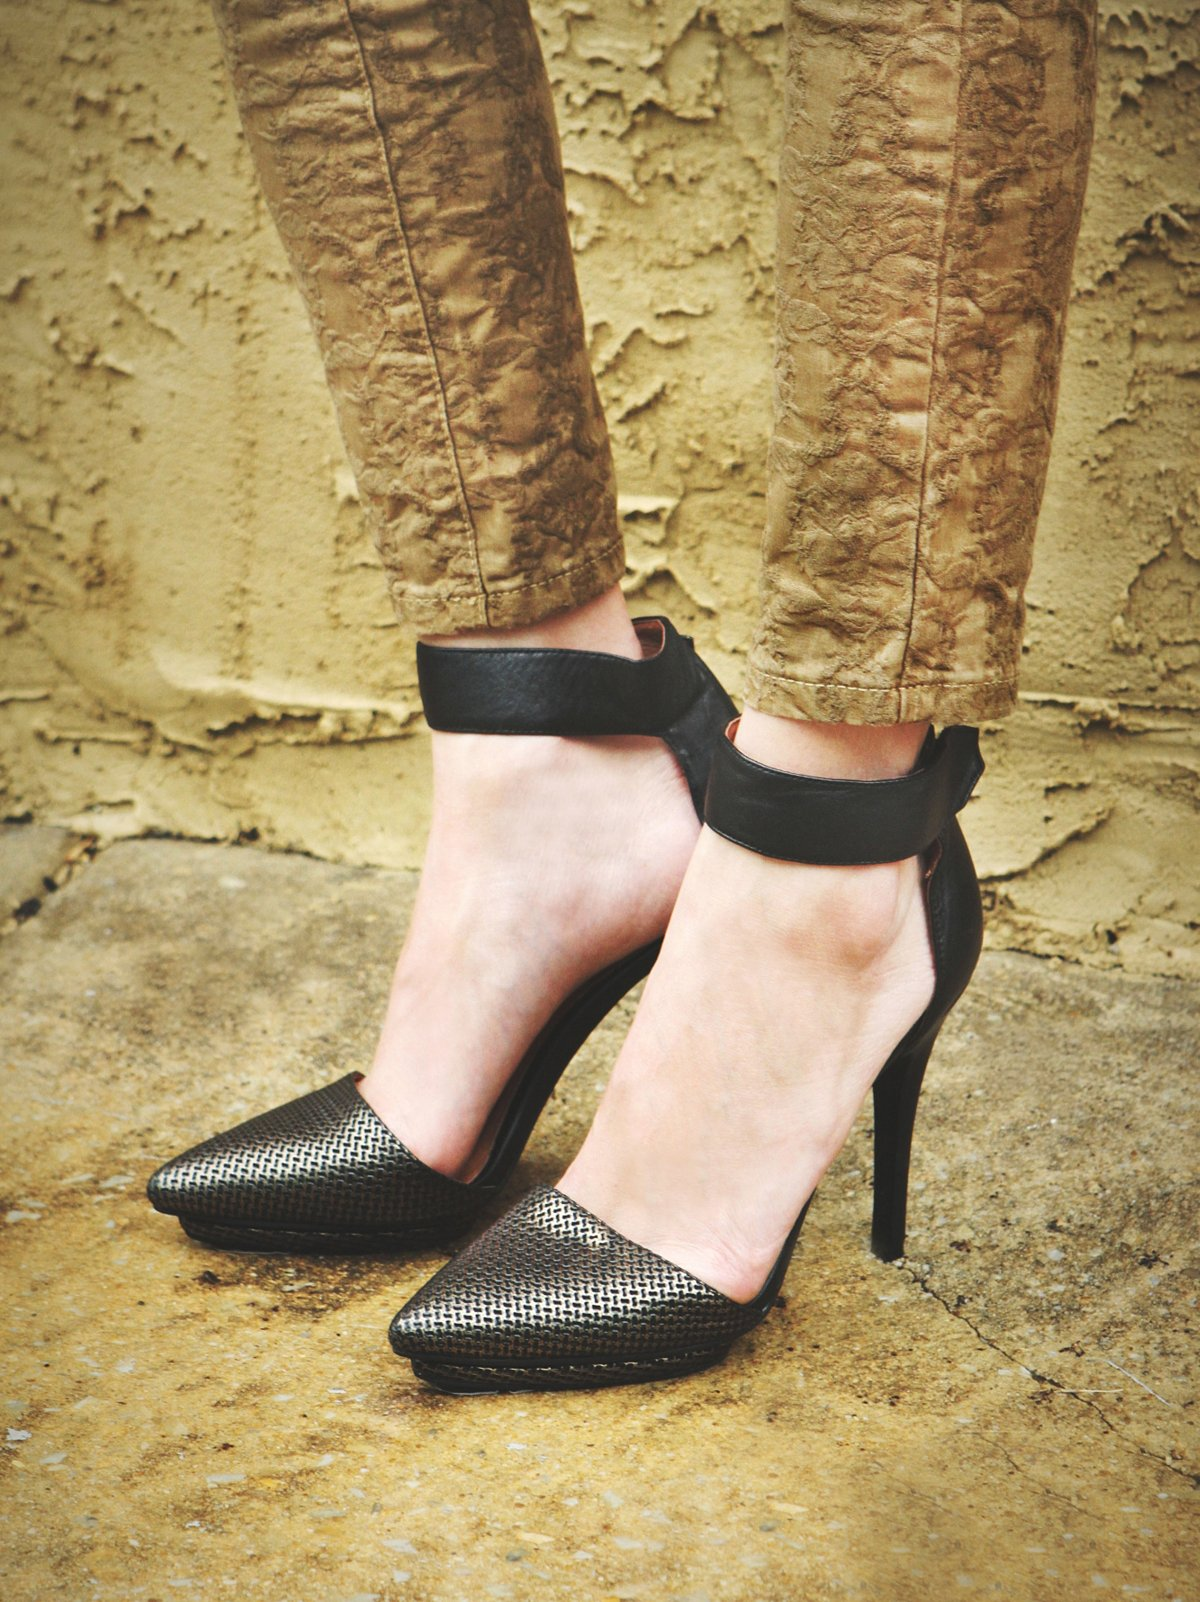 Solitaire高跟鞋